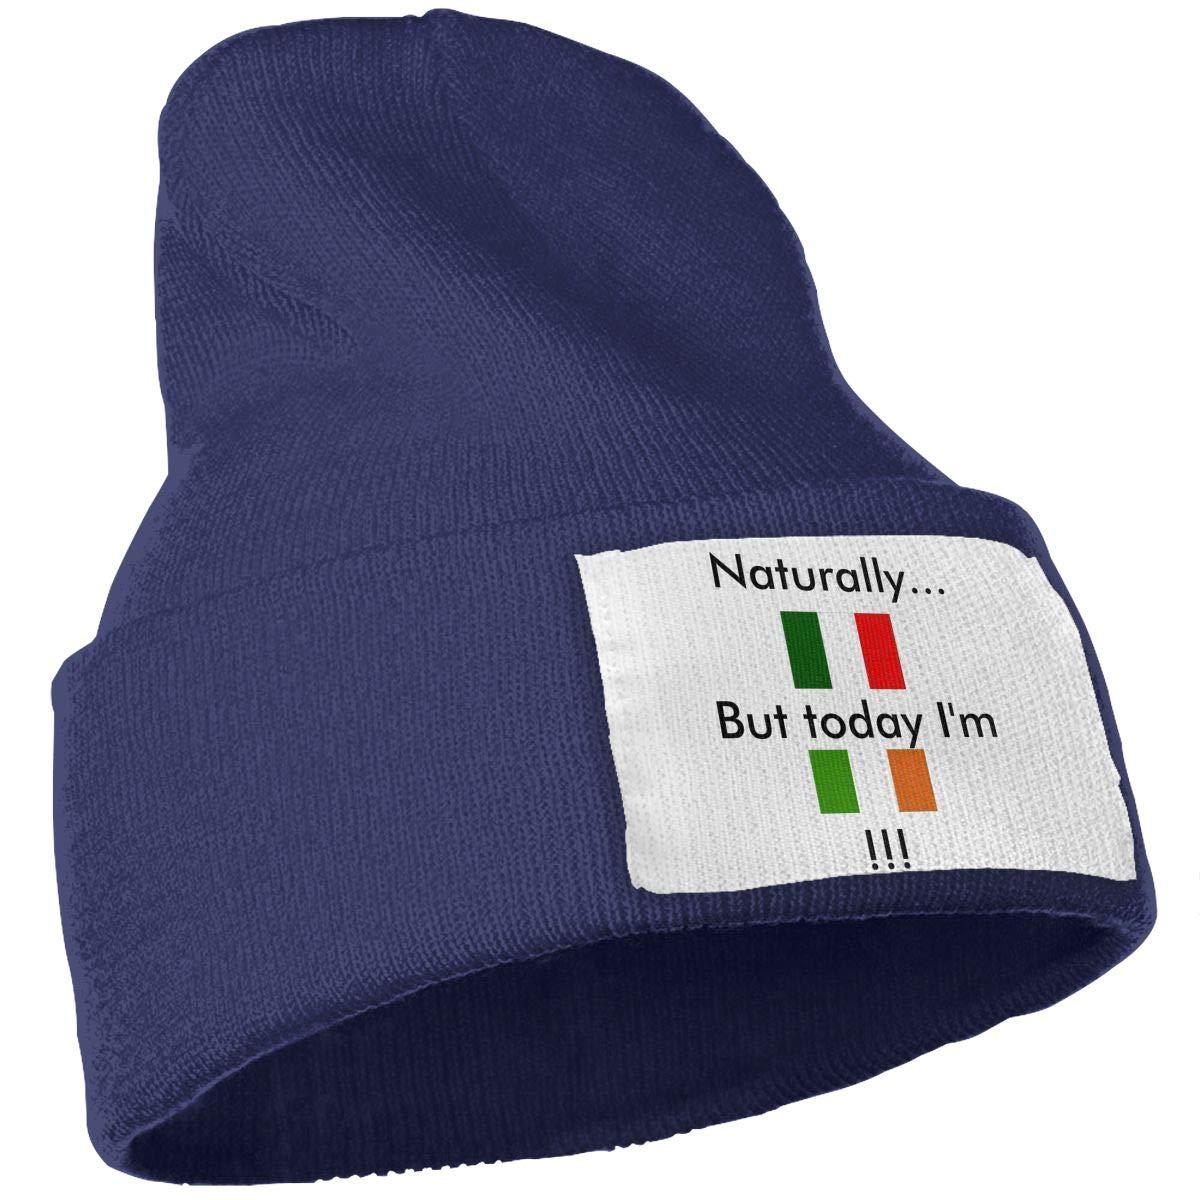 Naturally Italian But Today Im Irish Unisex Fashion Knitted Hat Luxury Hip-Hop Cap